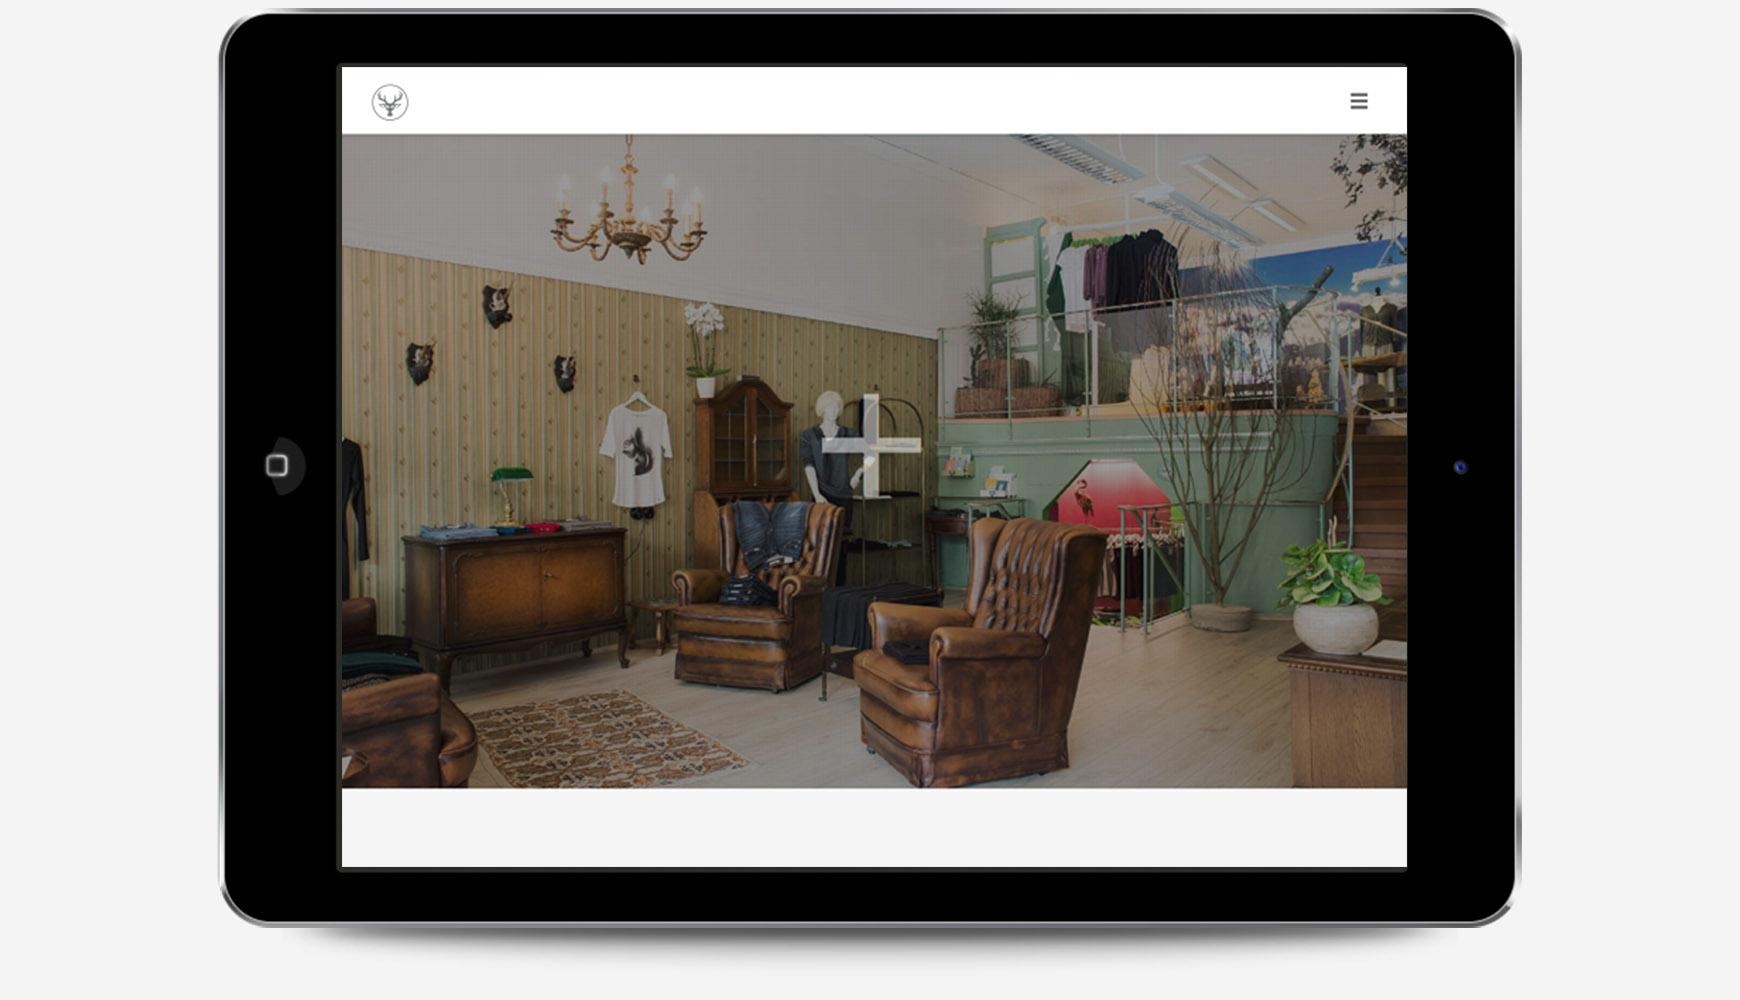 KK_Image Gallery_Tablet_LS